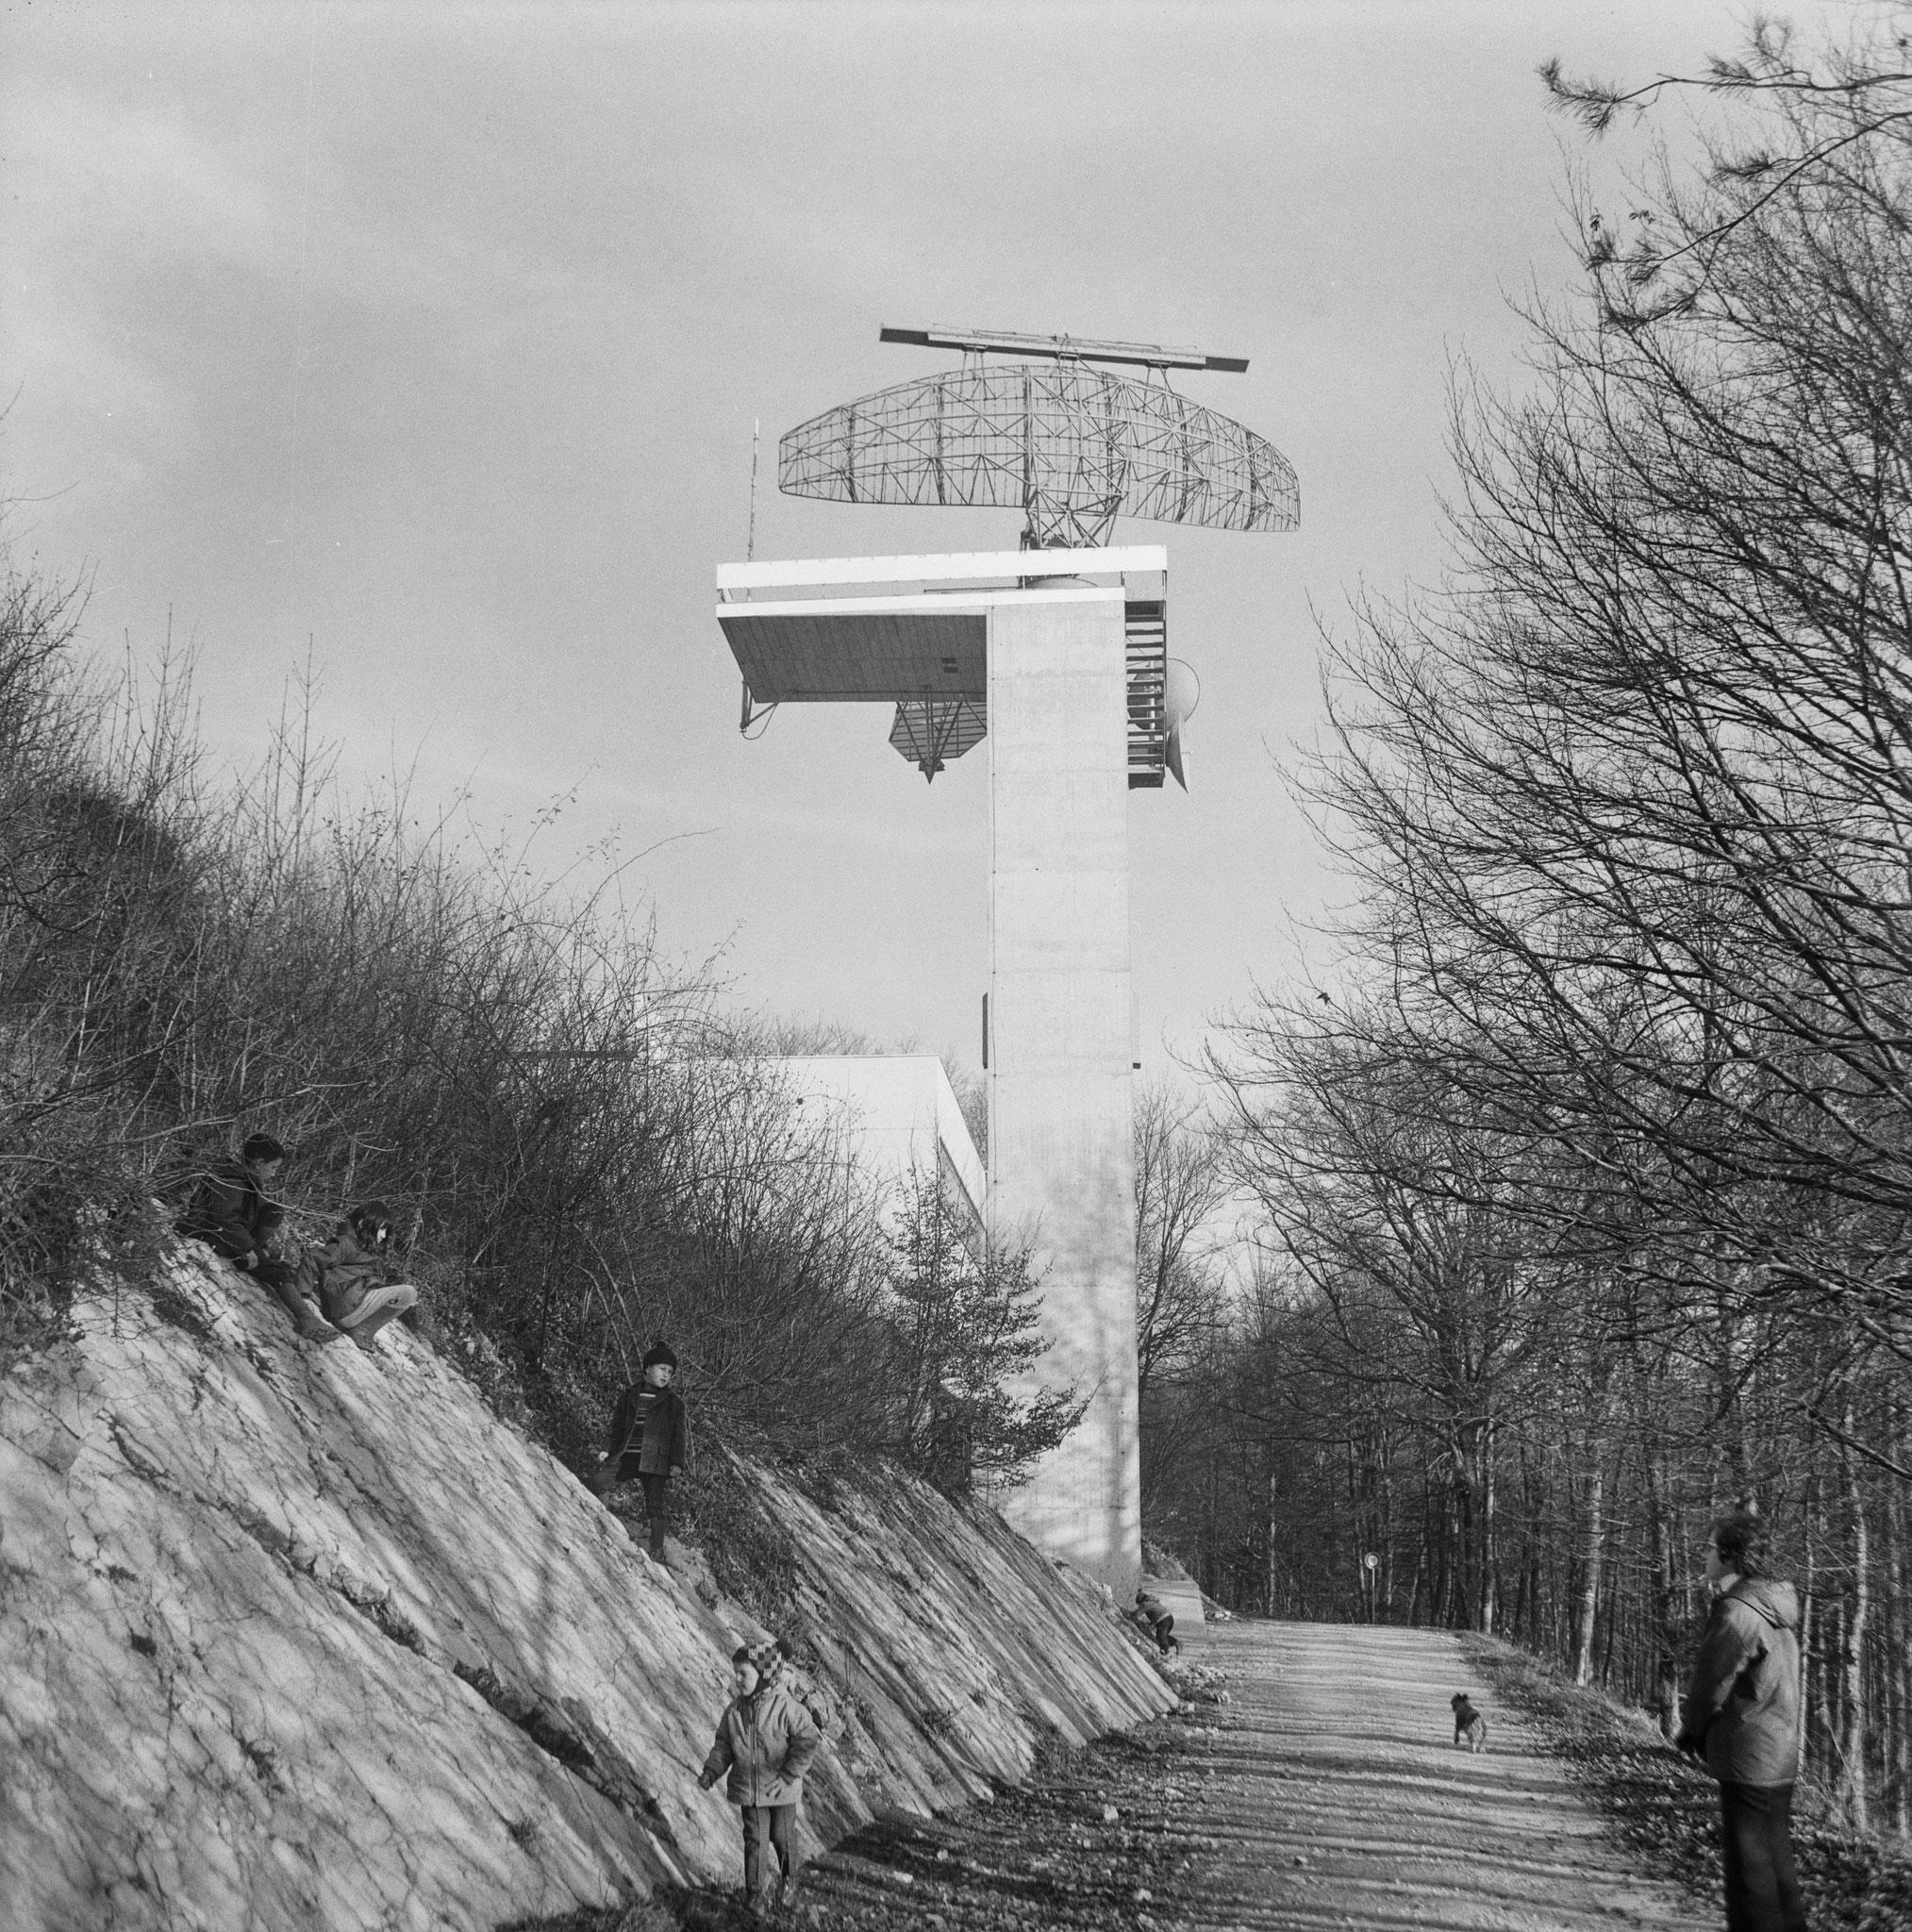 1961-1979::Erster Radarturm mit ungeschütztem Radar::Foto 30.11.1969::ETH-Bibliothek Zürich, Bildarchiv / Fotograf: Wyss, Max A. / Com_M18-0100-0002 / CC BY-SA 4.0